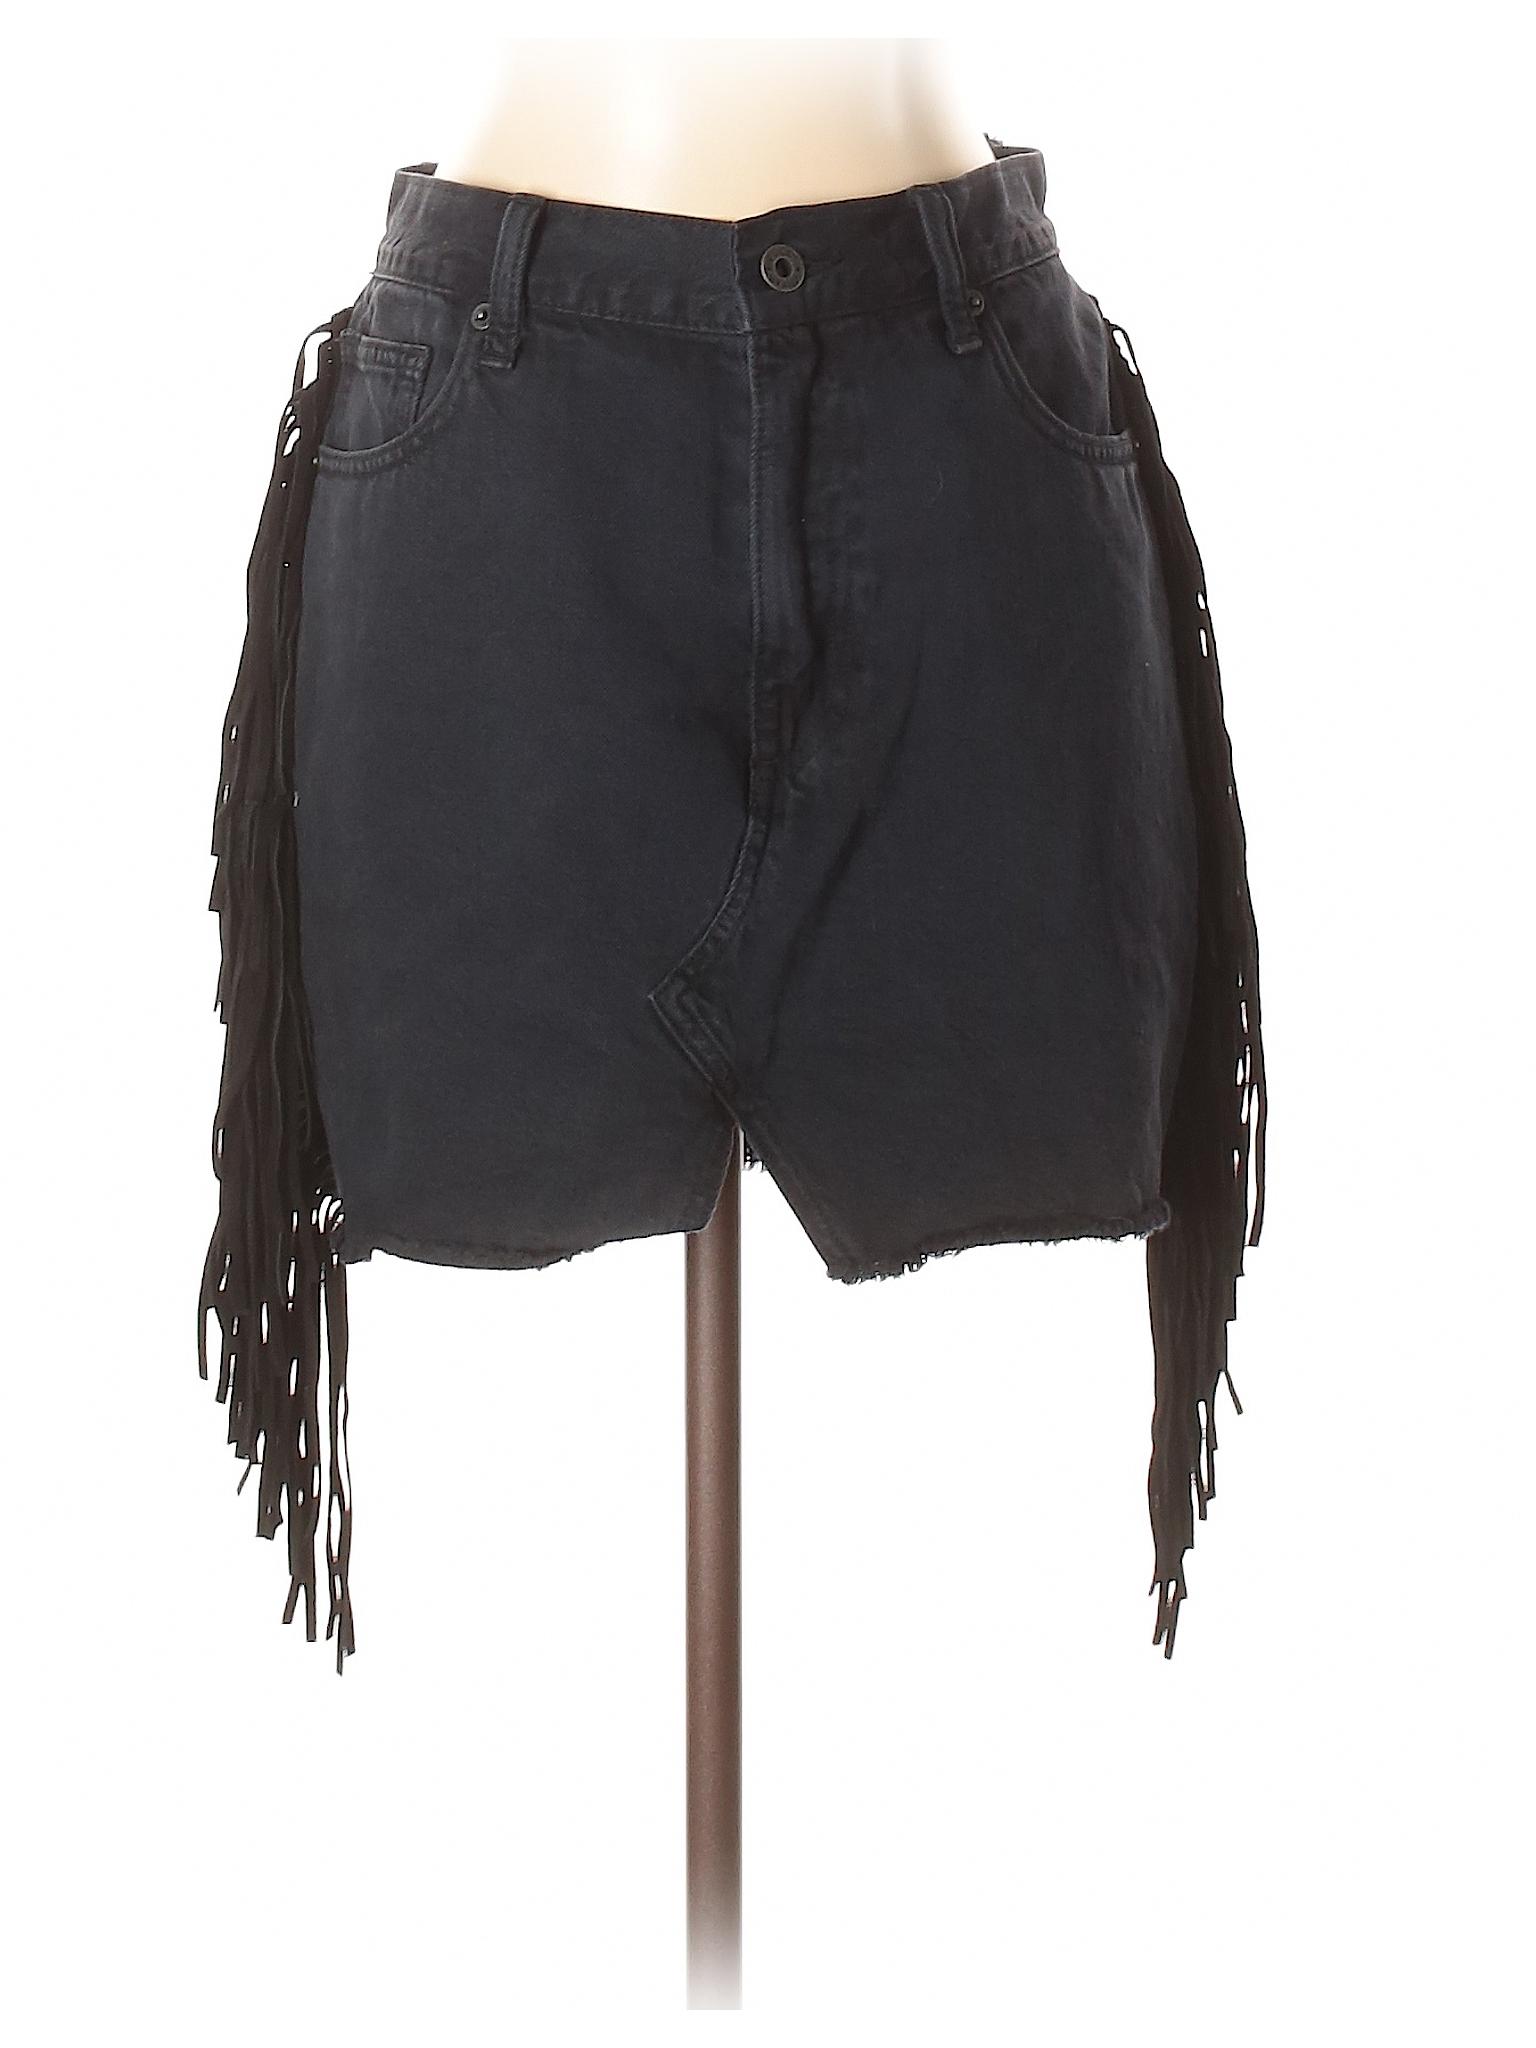 Brand leisure Denim Skirt Lucky Boutique Tqv8xvE